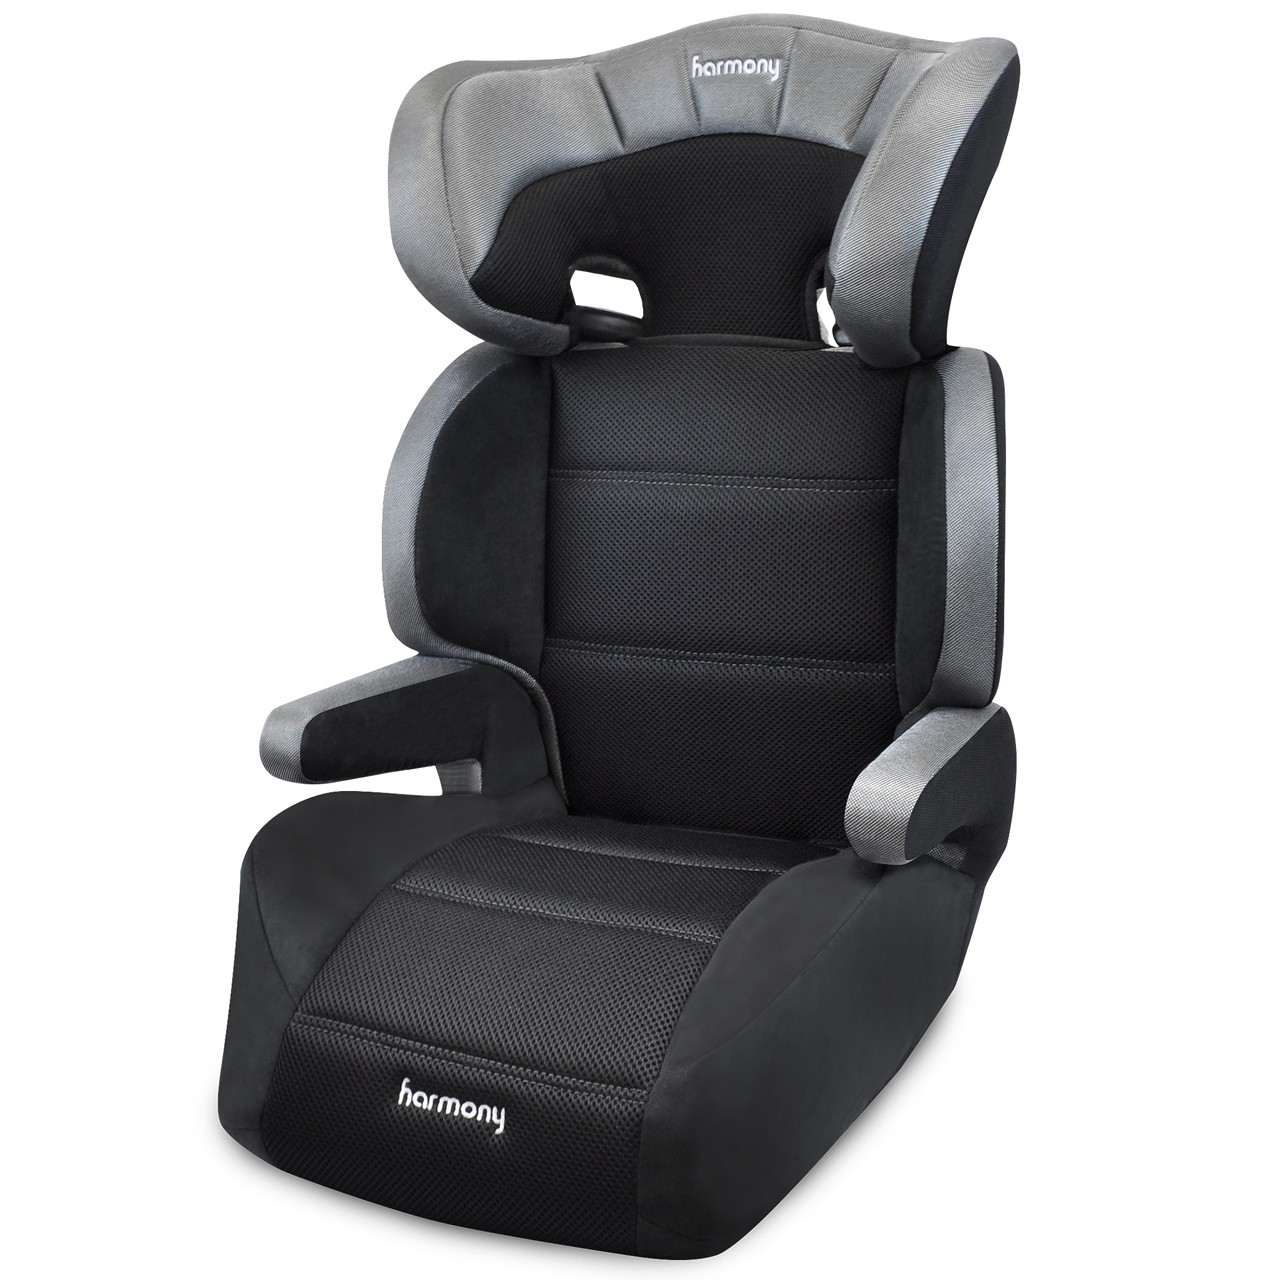 Harmony Car Seat Manual